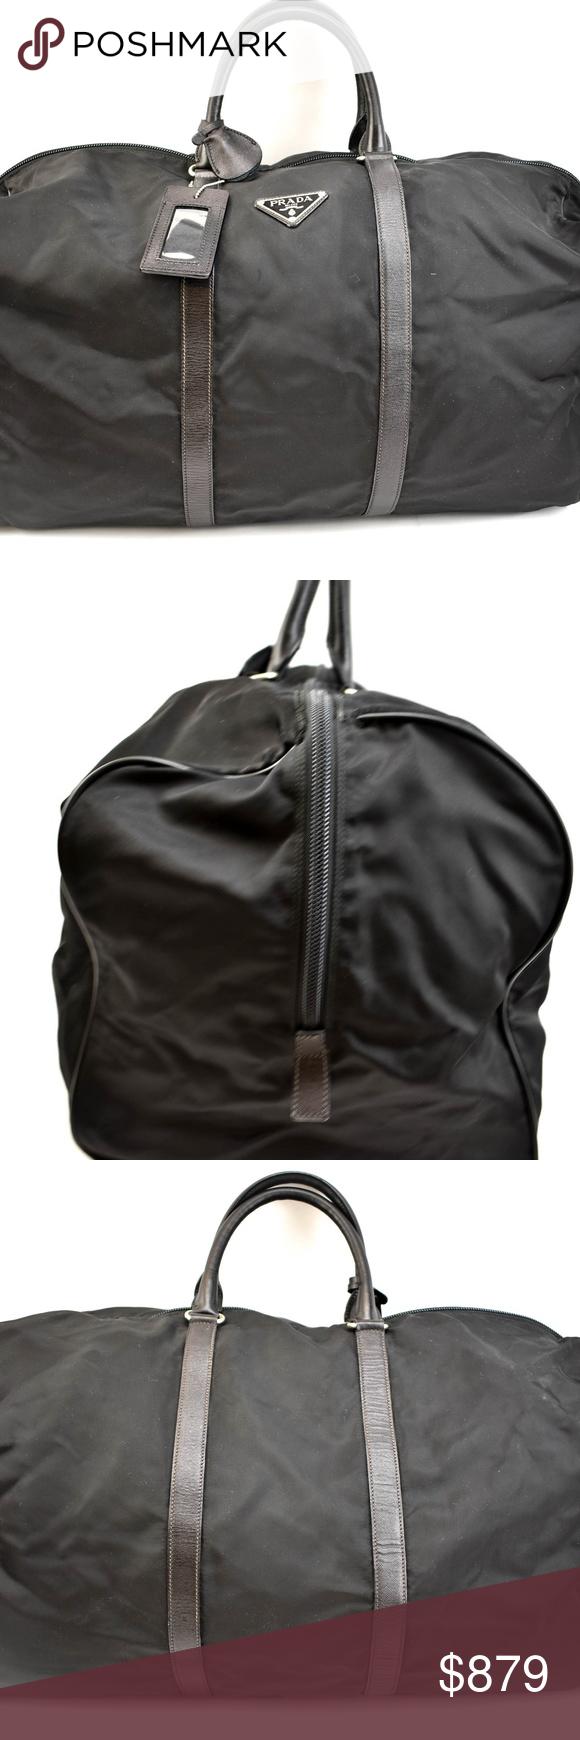 32896c1e1f41 PRADA Black Nylon Leather   Logo Weekender Bag nw pre-owned (zoom photos